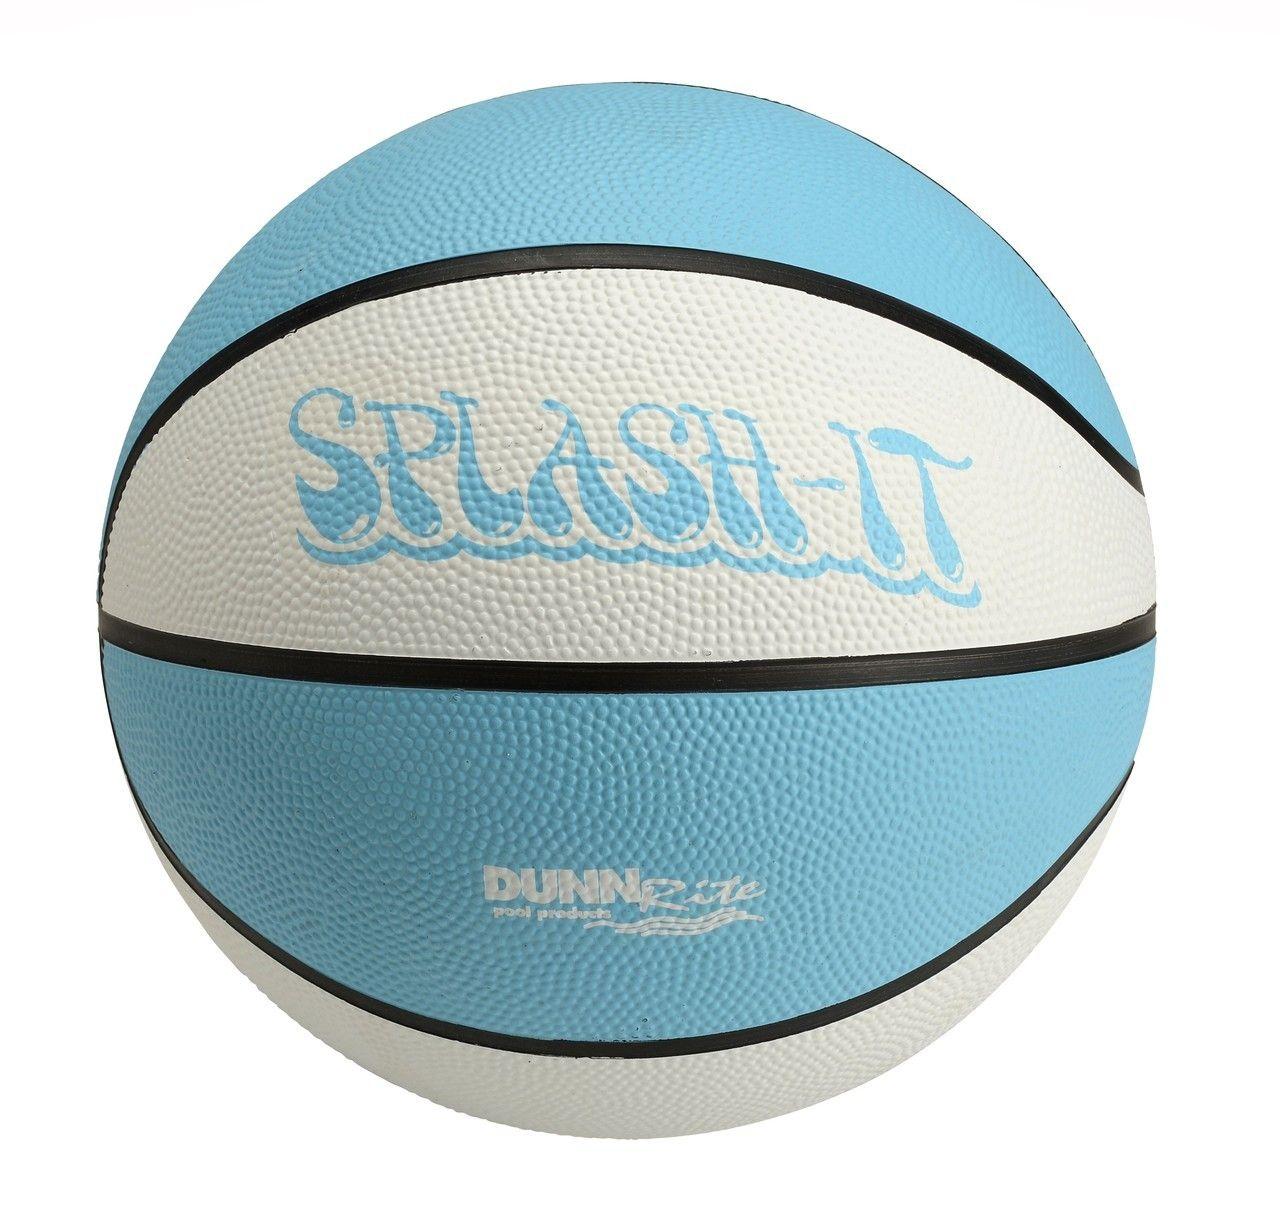 "Splash and Slam/Splash and Shoot Ball 9"" dia B110 Pool"